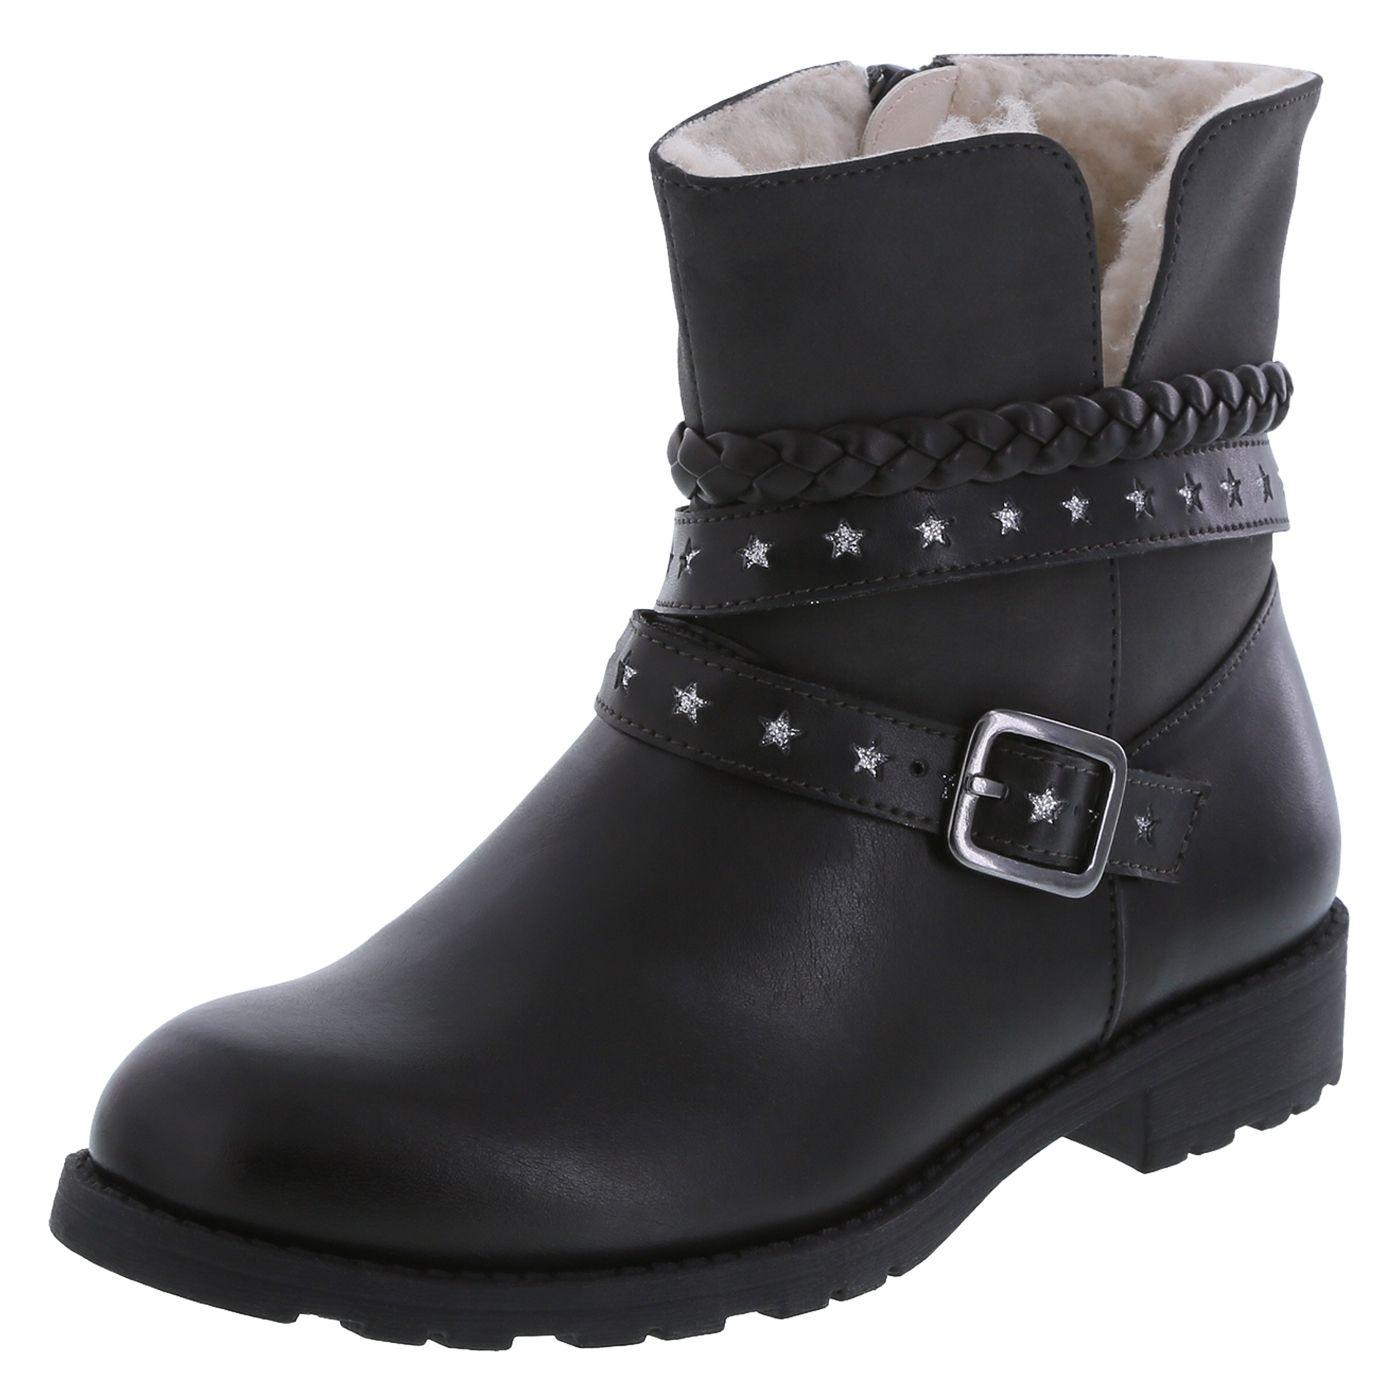 a432eba101 Girls Descendants Strap Boot | Descendants | Payless ShoeSource ...